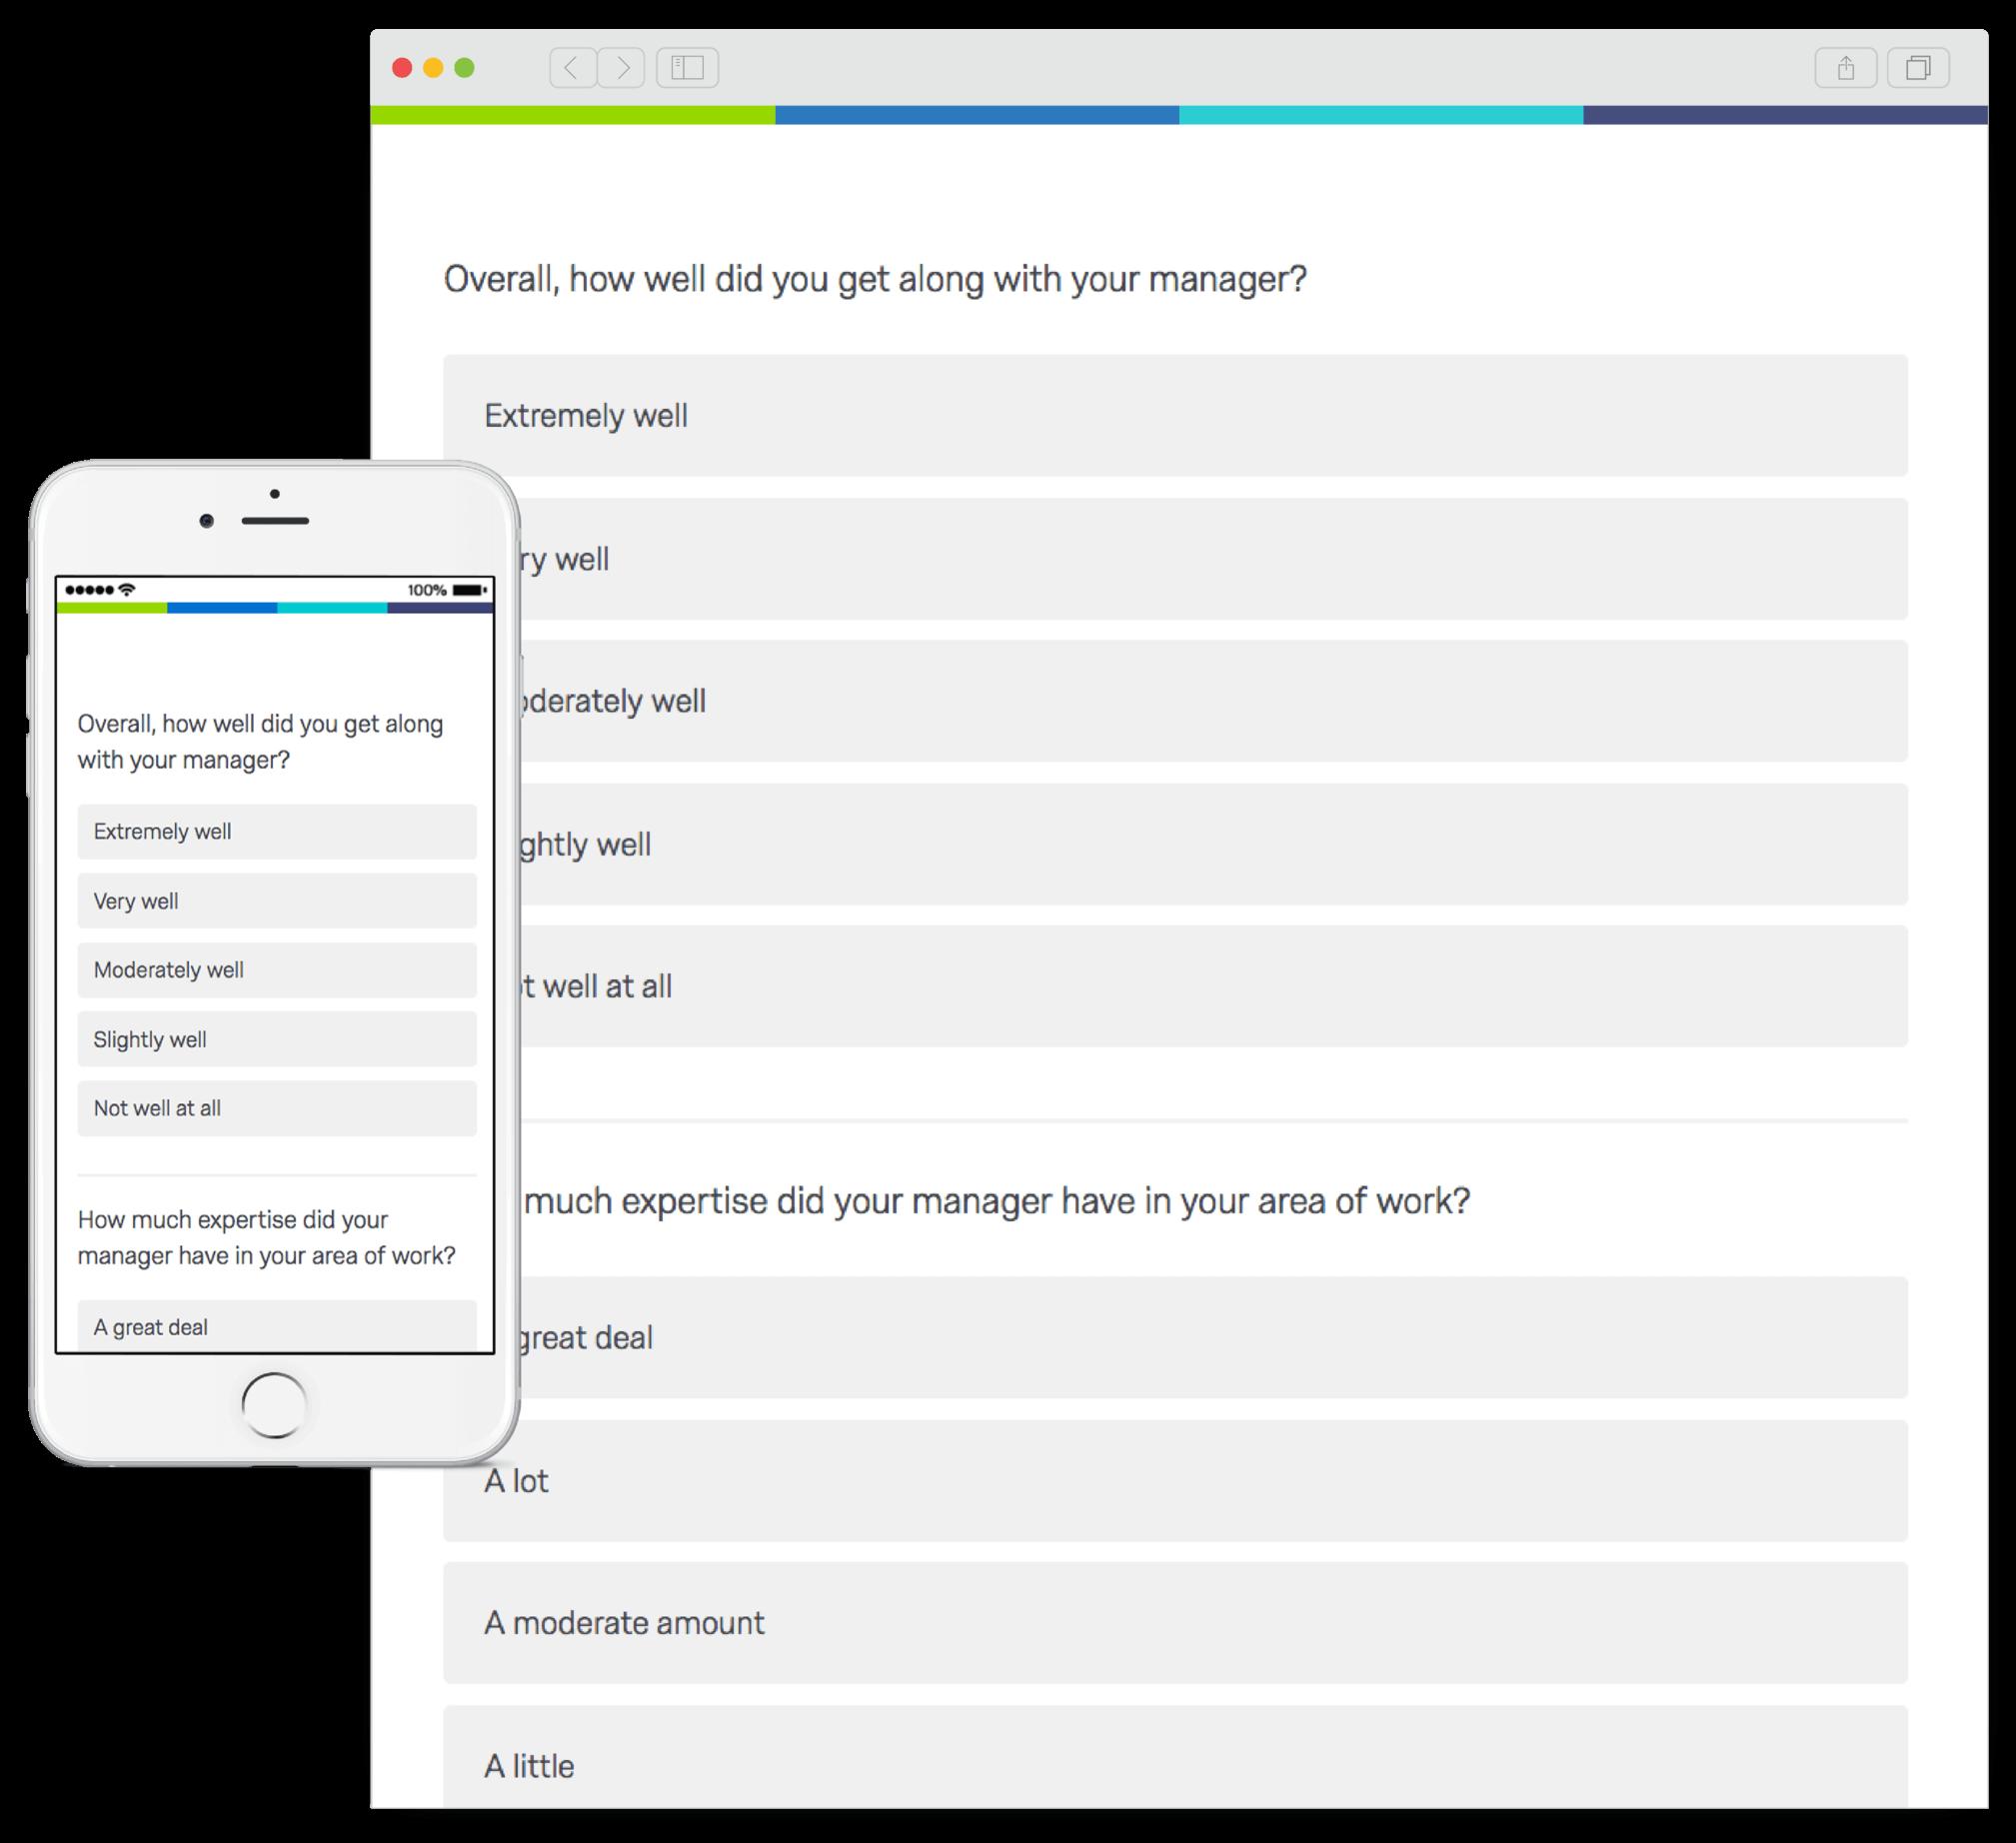 To survey how pdf qualtrics in